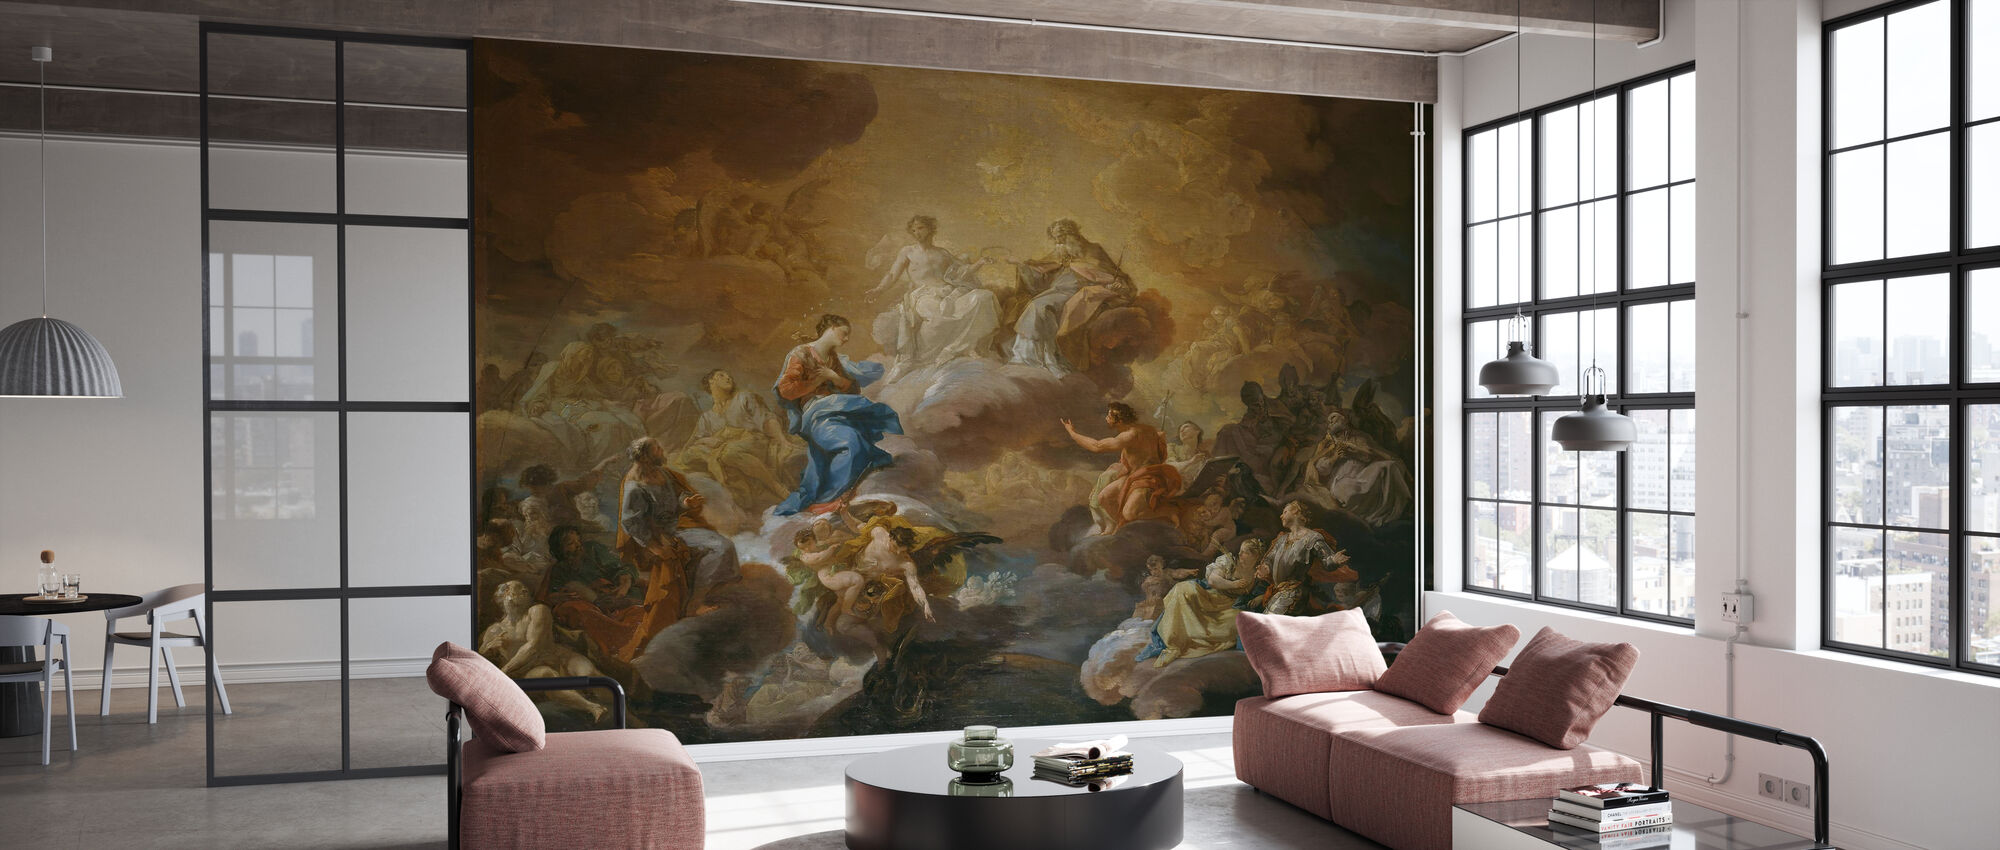 Holy Trinity - Corrado Giaquinto - Wallpaper - Office